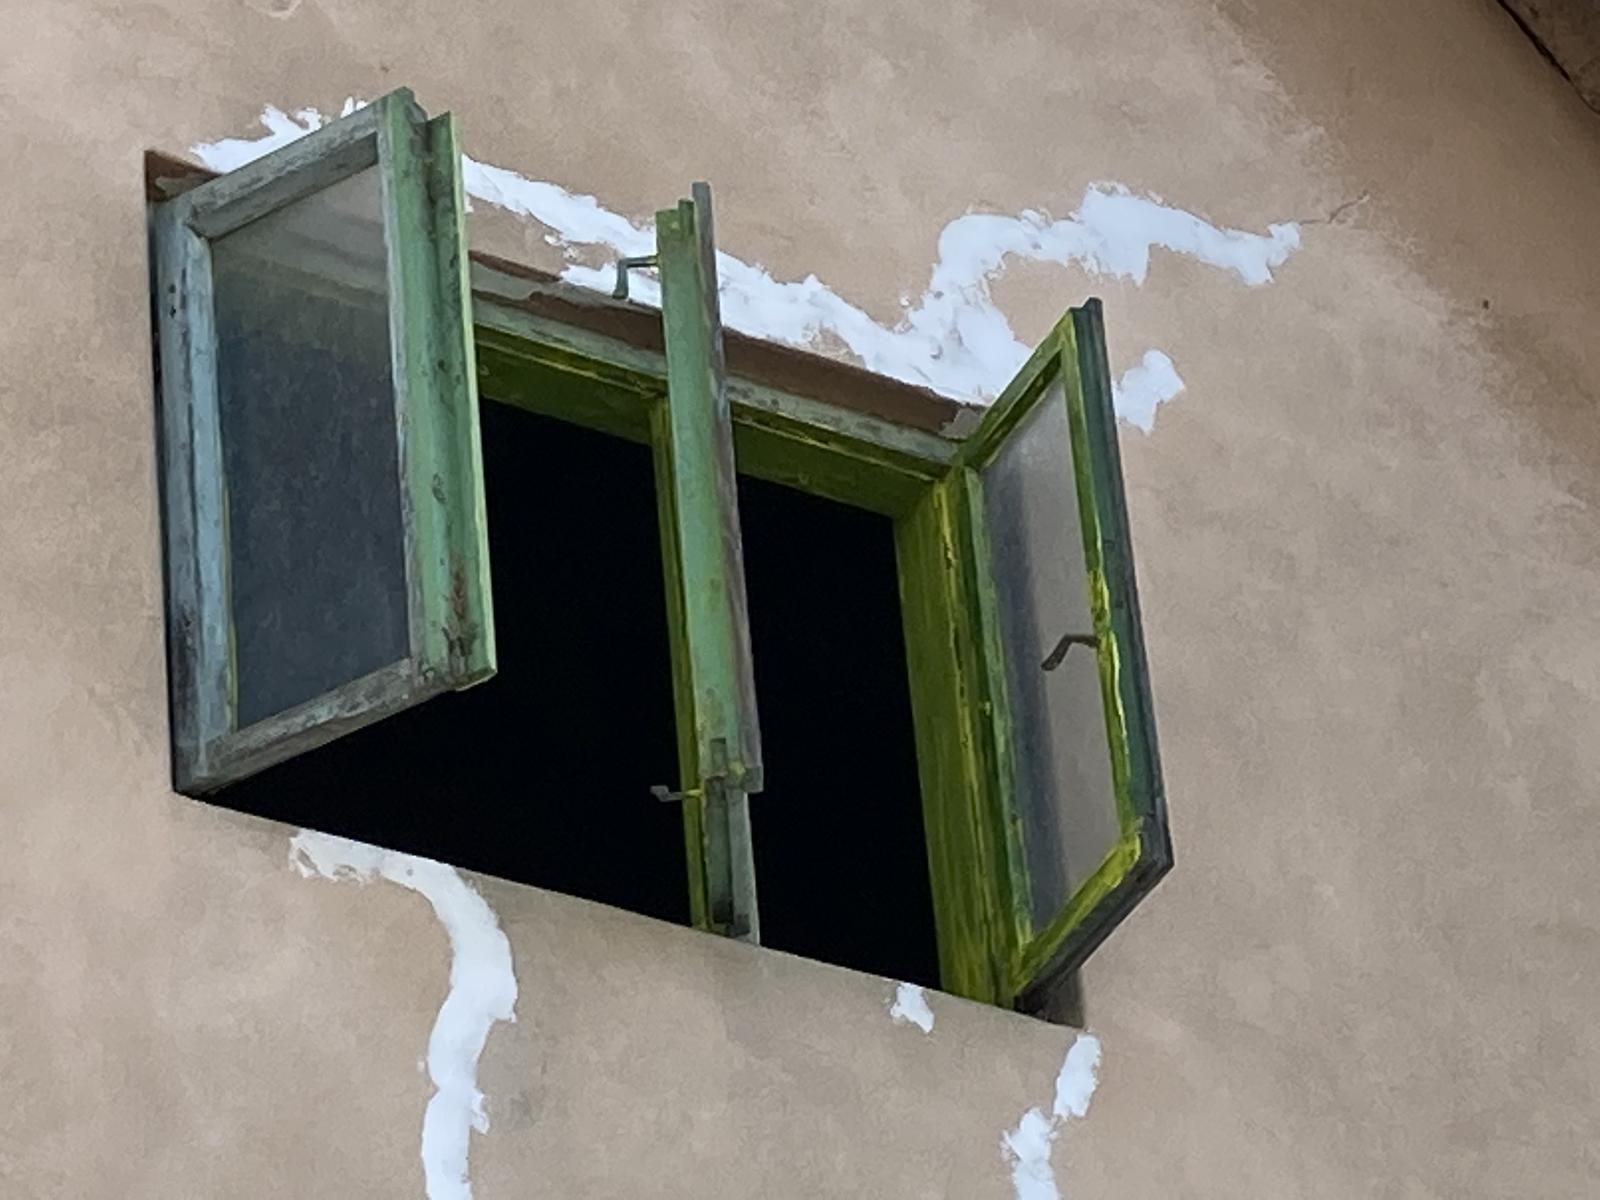 Dom - prvy nater ani nevidno 🤷🏼♀️